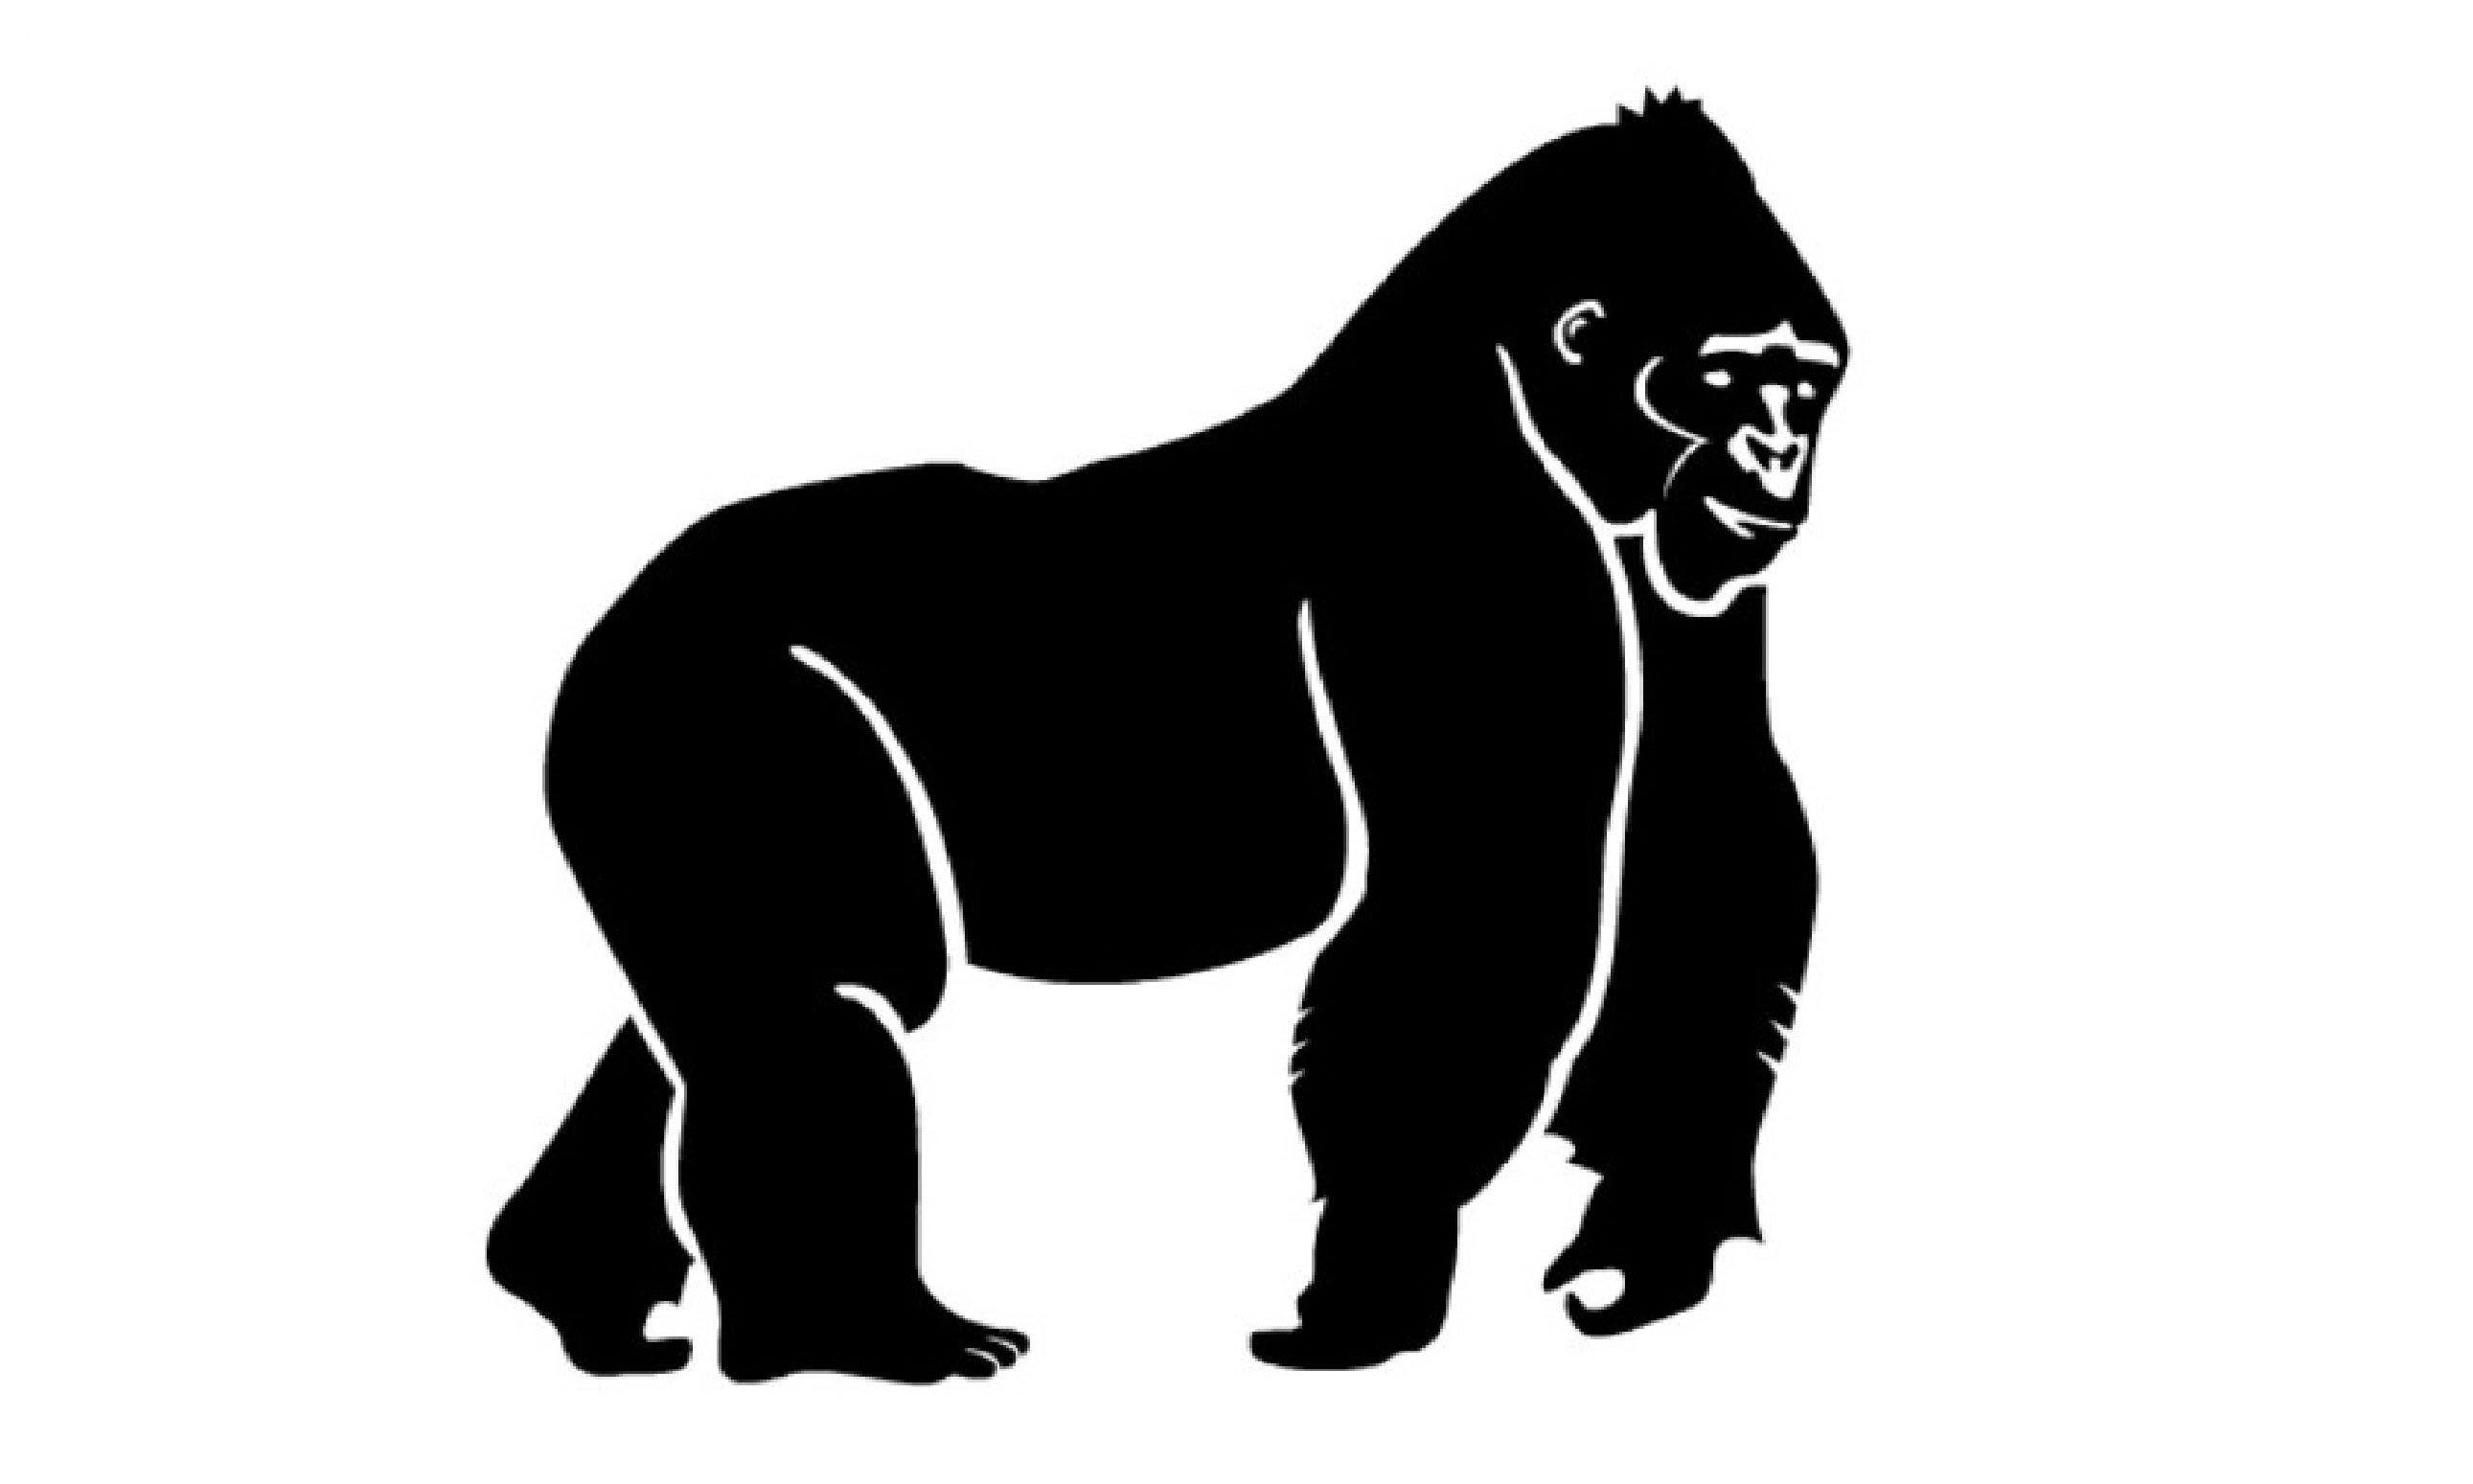 Gorilla svg #14, Download drawings